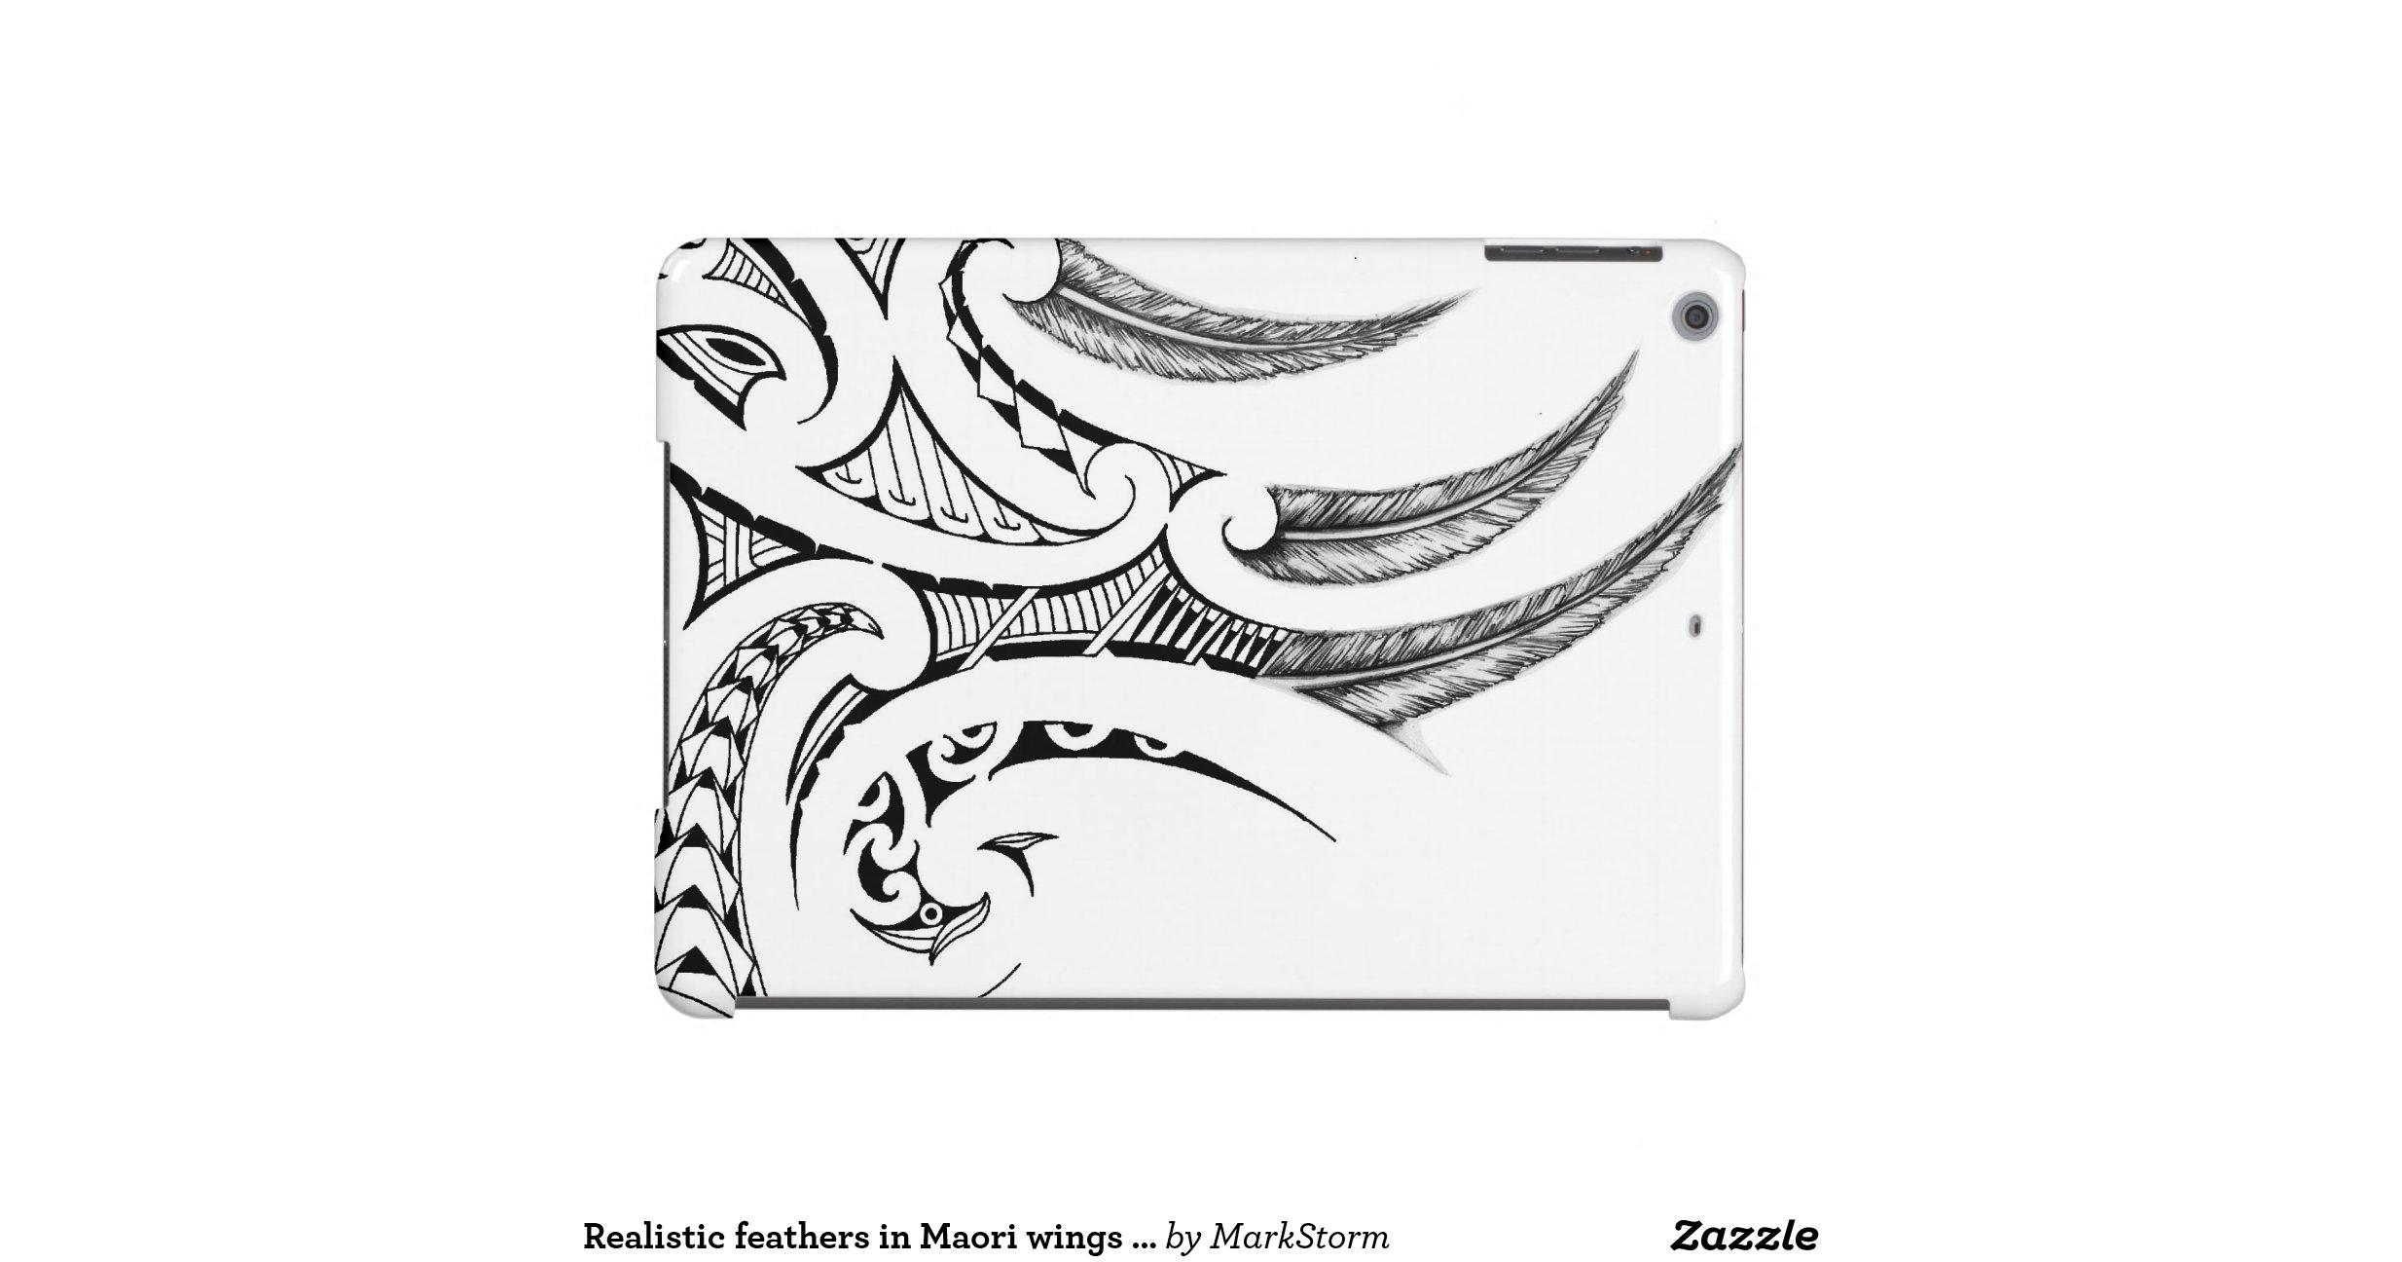 Maori Feather Tattoo: Realistic Feathers In Maori Wings Tattoo Design Cover For